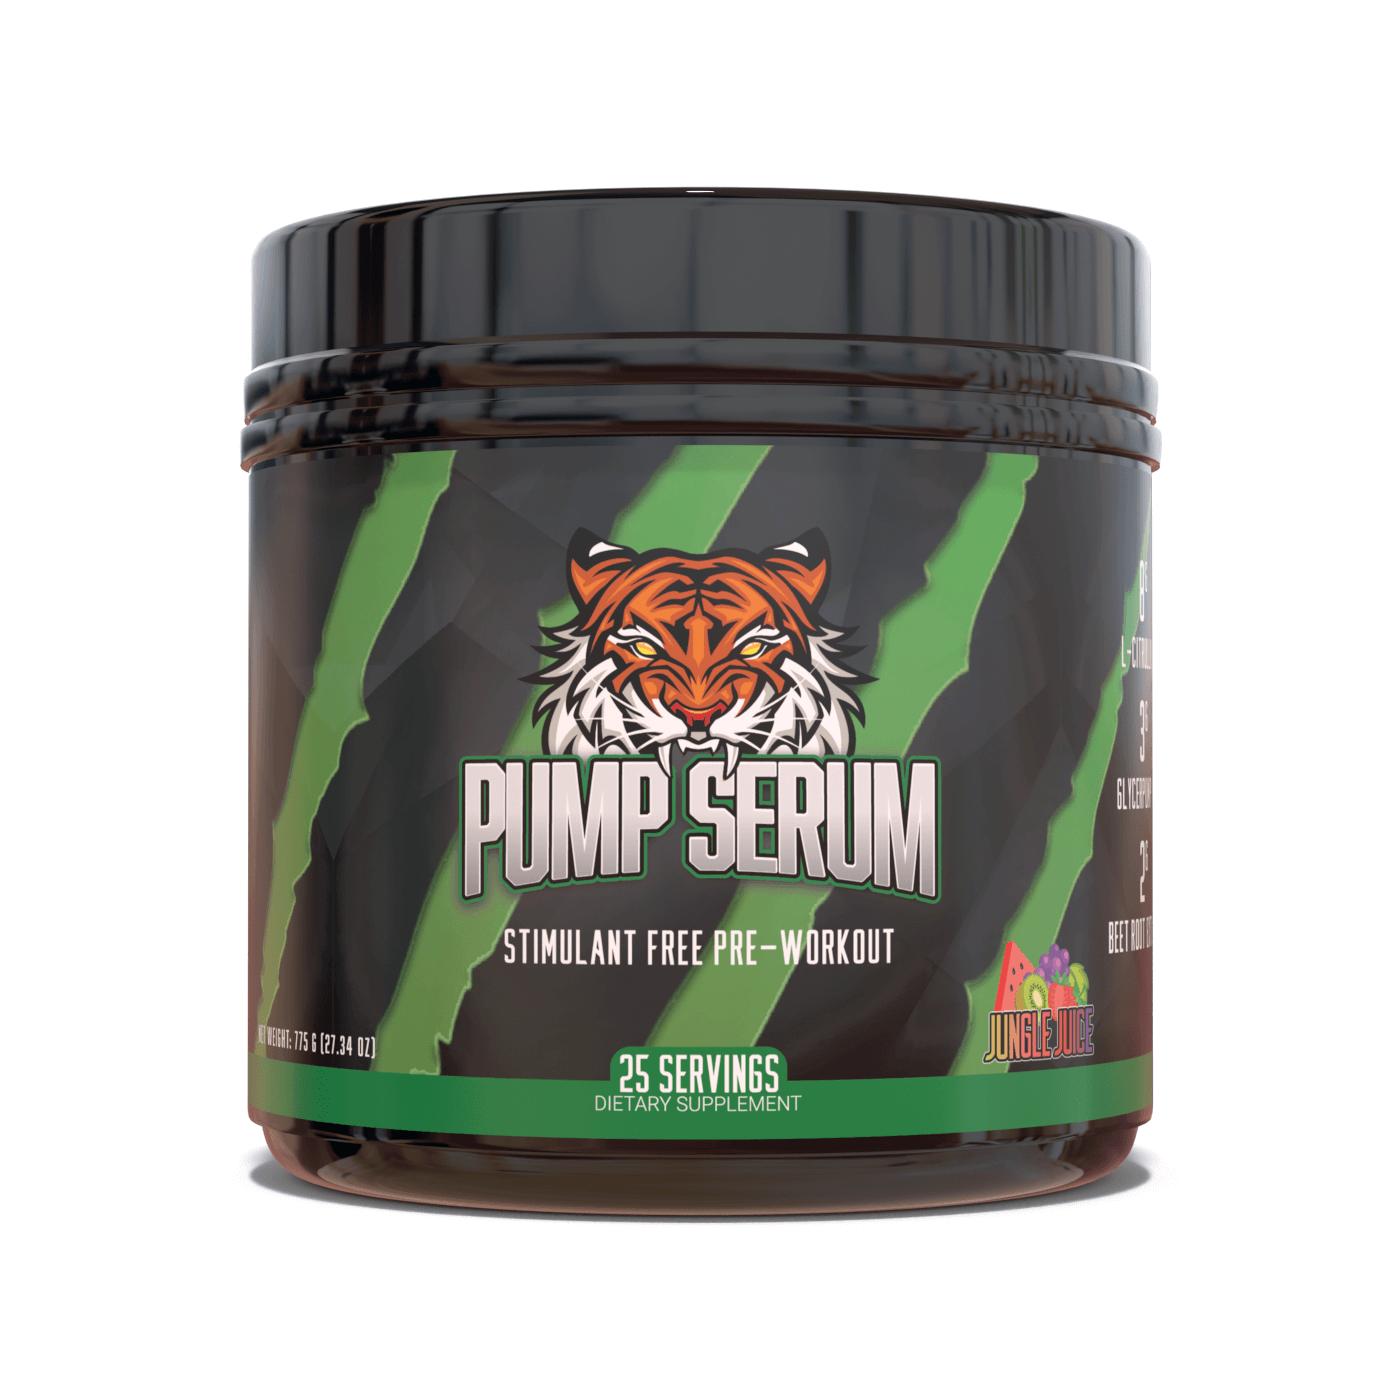 Pump Serum Non-Stimulant Pre-Workout (25 Servings)